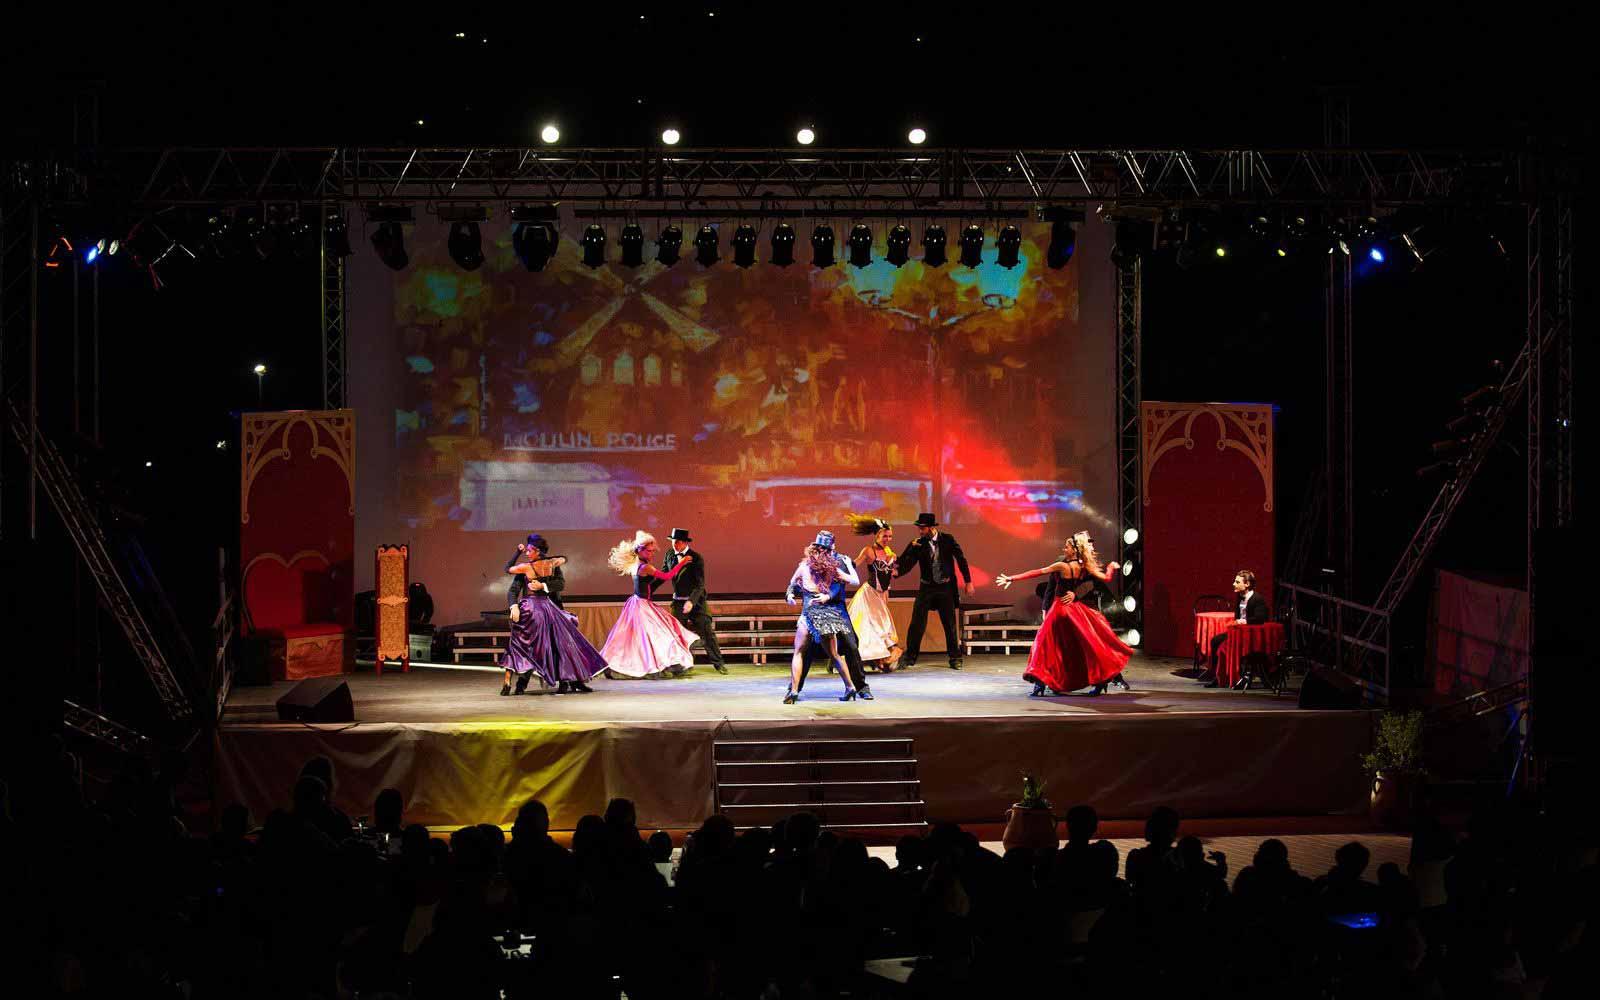 Evening entertainment at the Chia Laguna Resort